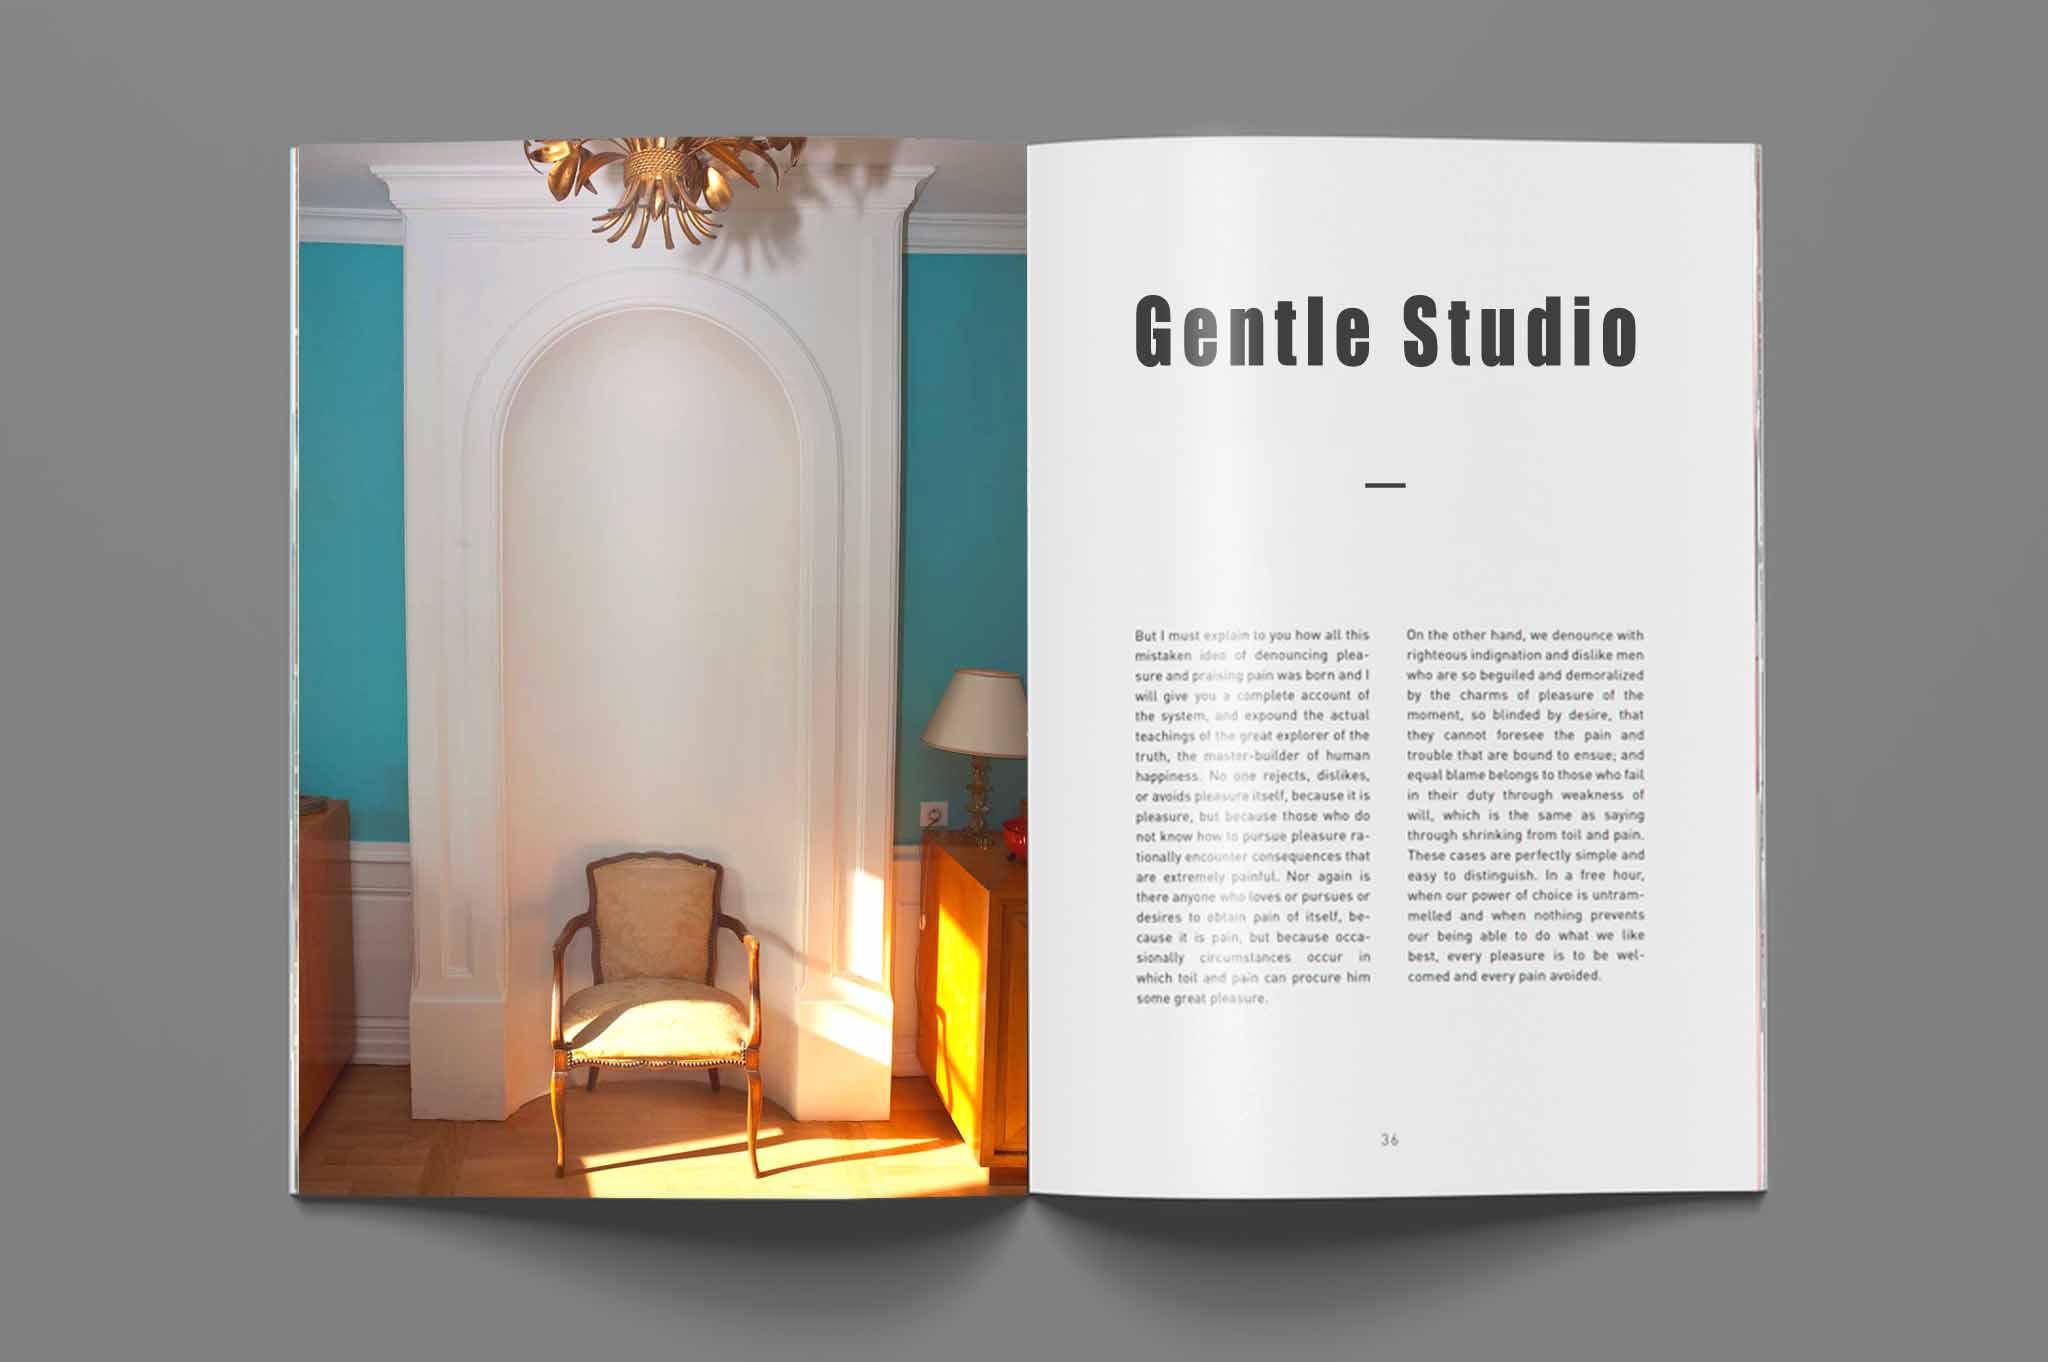 magazine-mockup-deco-gentlestudio-photographer-photographe-immobilier-reportage